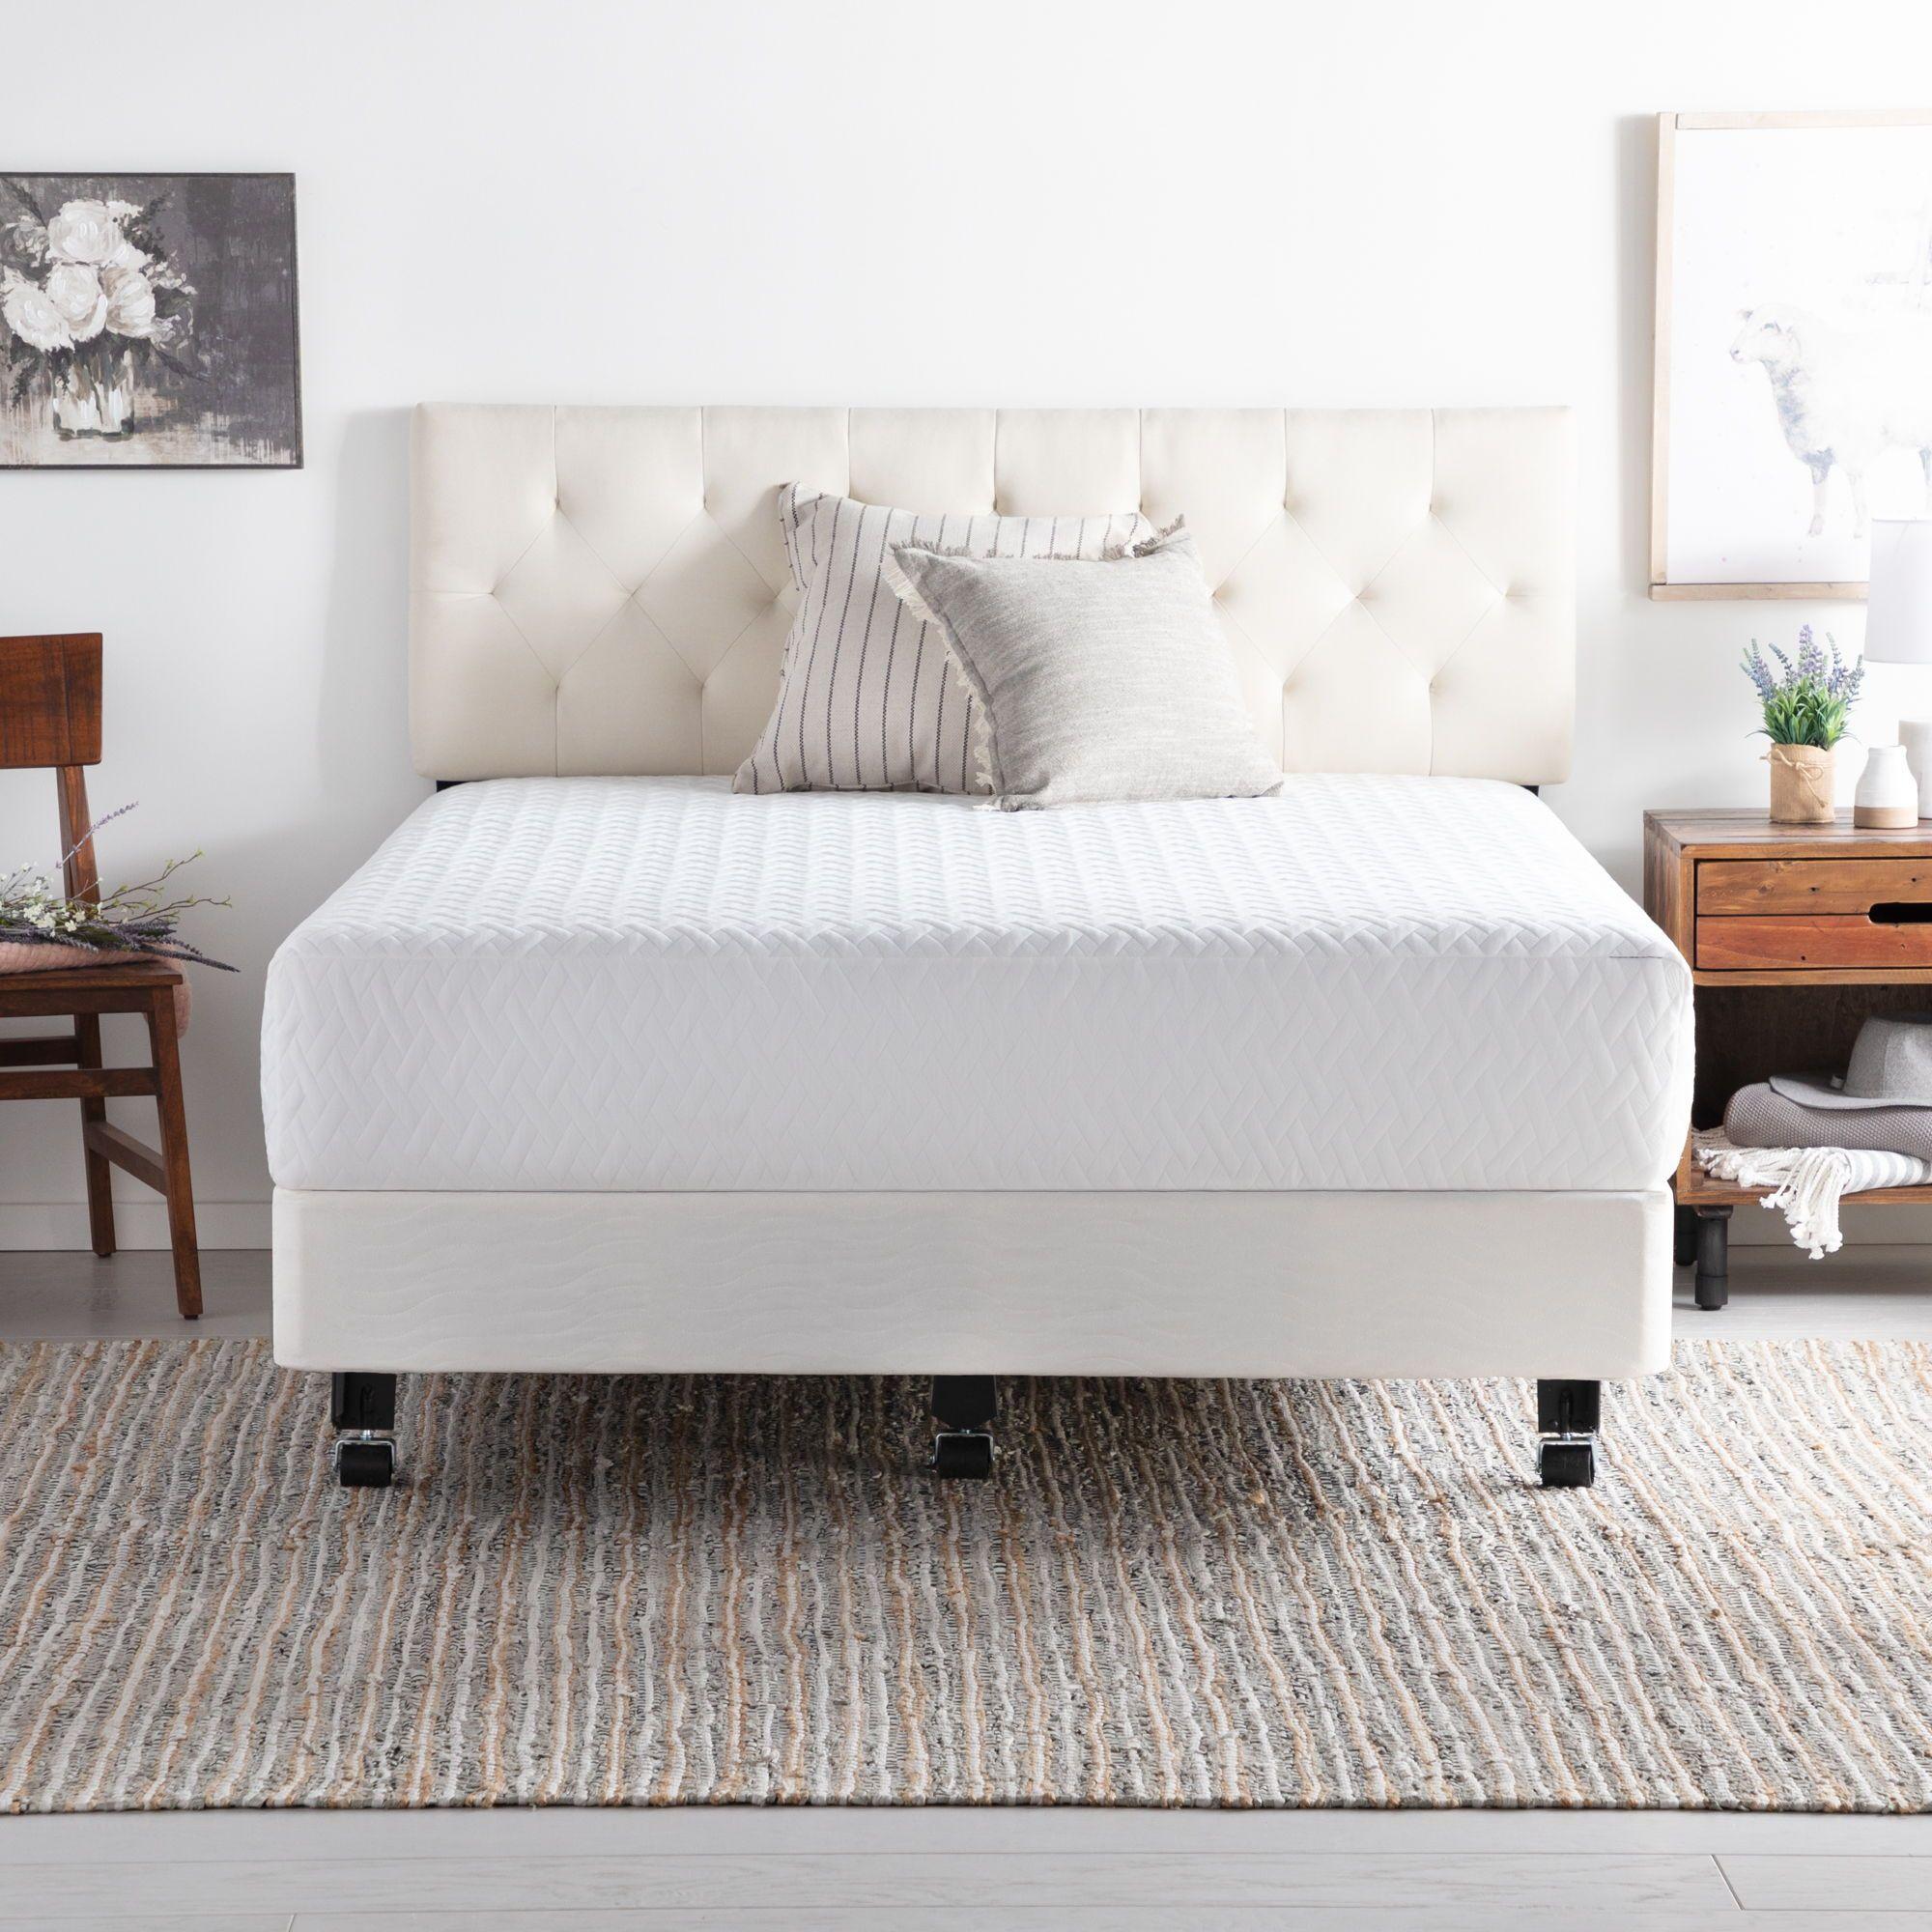 Best Brookside Universal Adjustable Metal Bed Frame With Center 400 x 300